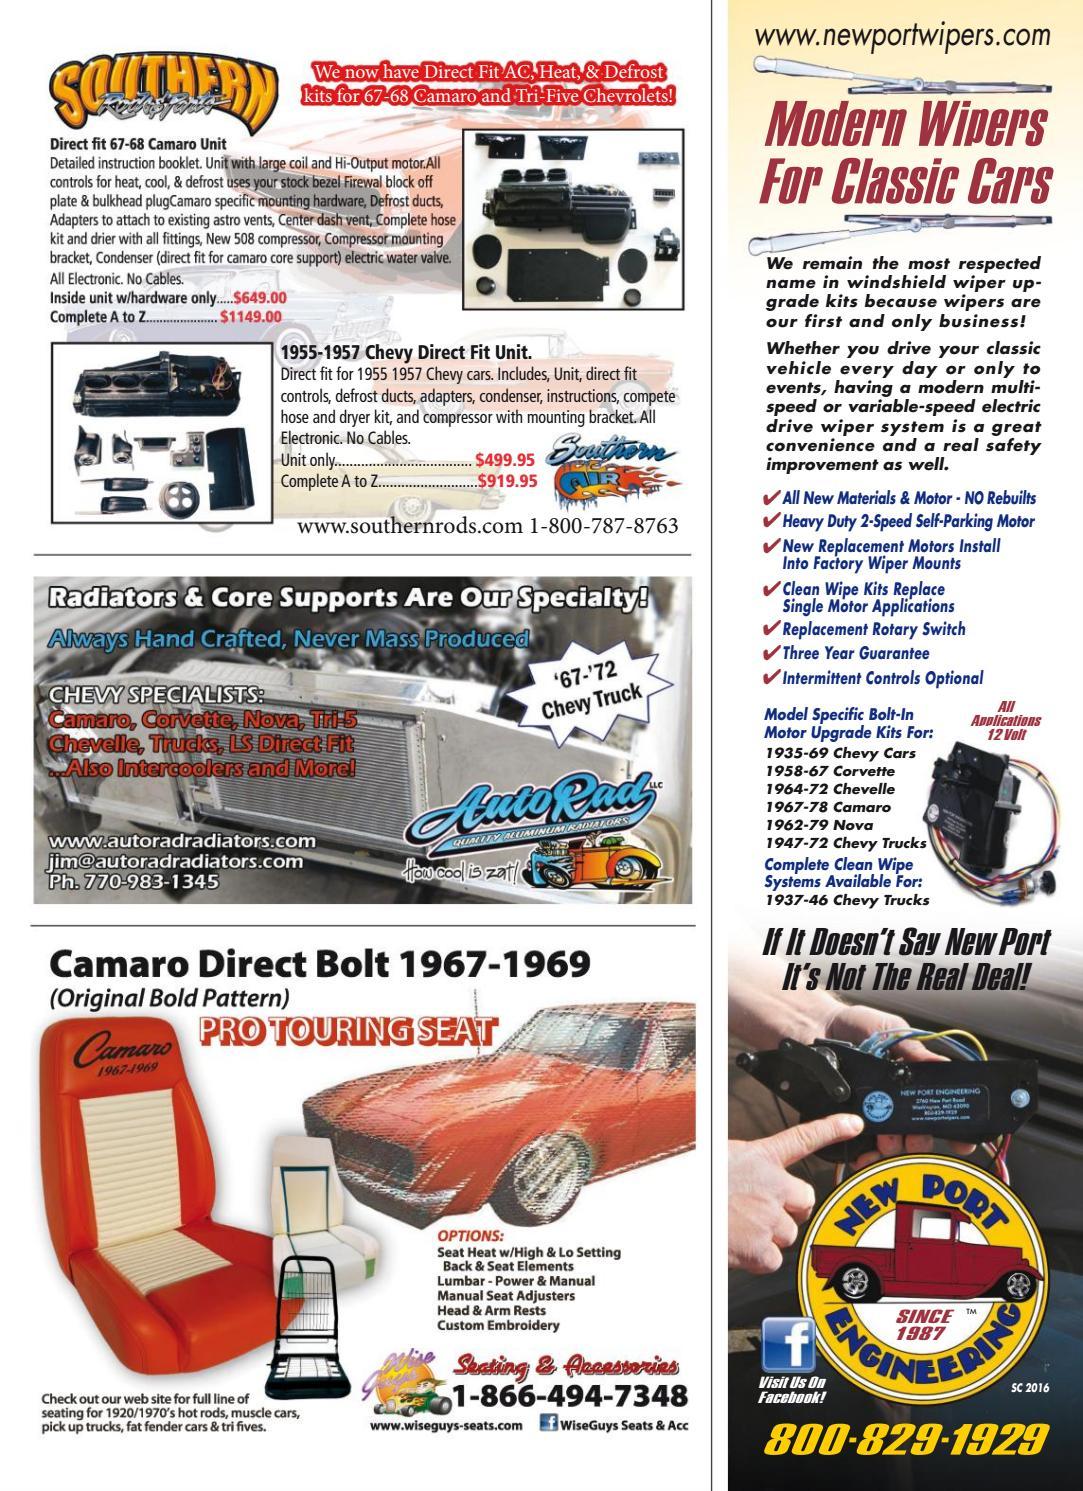 1957 Chevy Truck 12 Volt 1955 1956 1958 1959 Heater Box Chevrolet Steering Column Wiring Diagram 1971 C10 Custom U2022